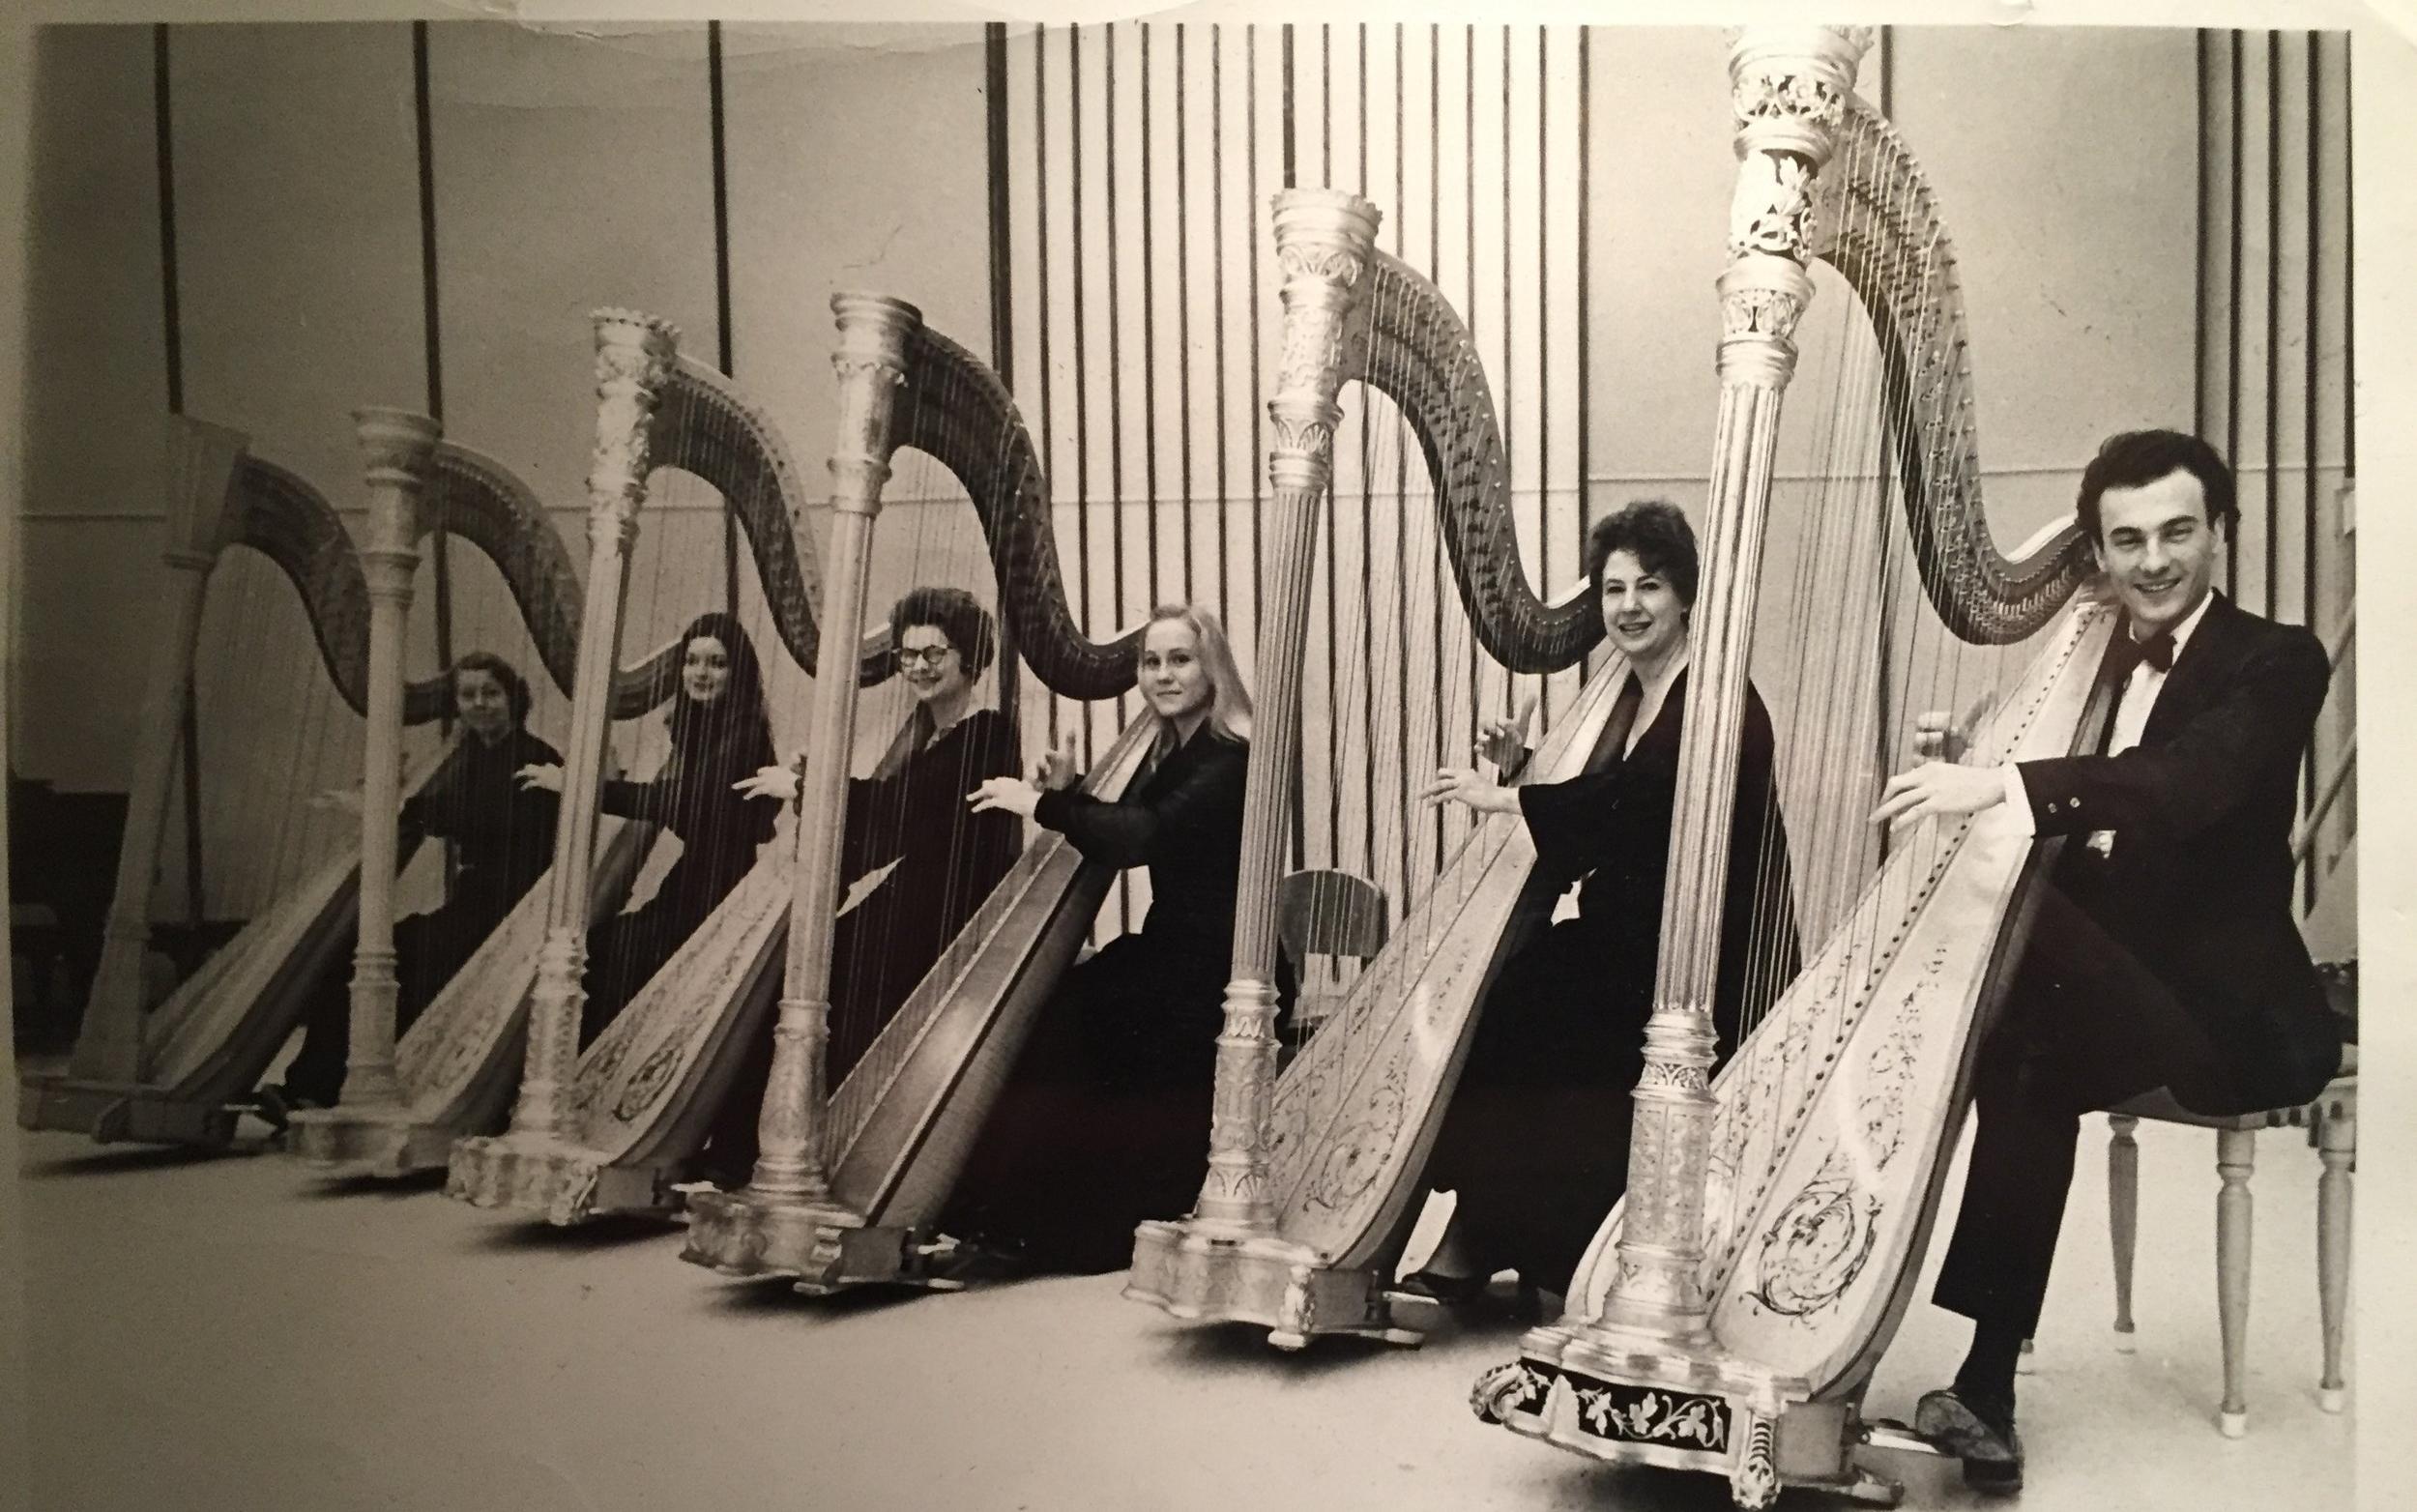 David Williams, far right, with SMU harp ensemble.